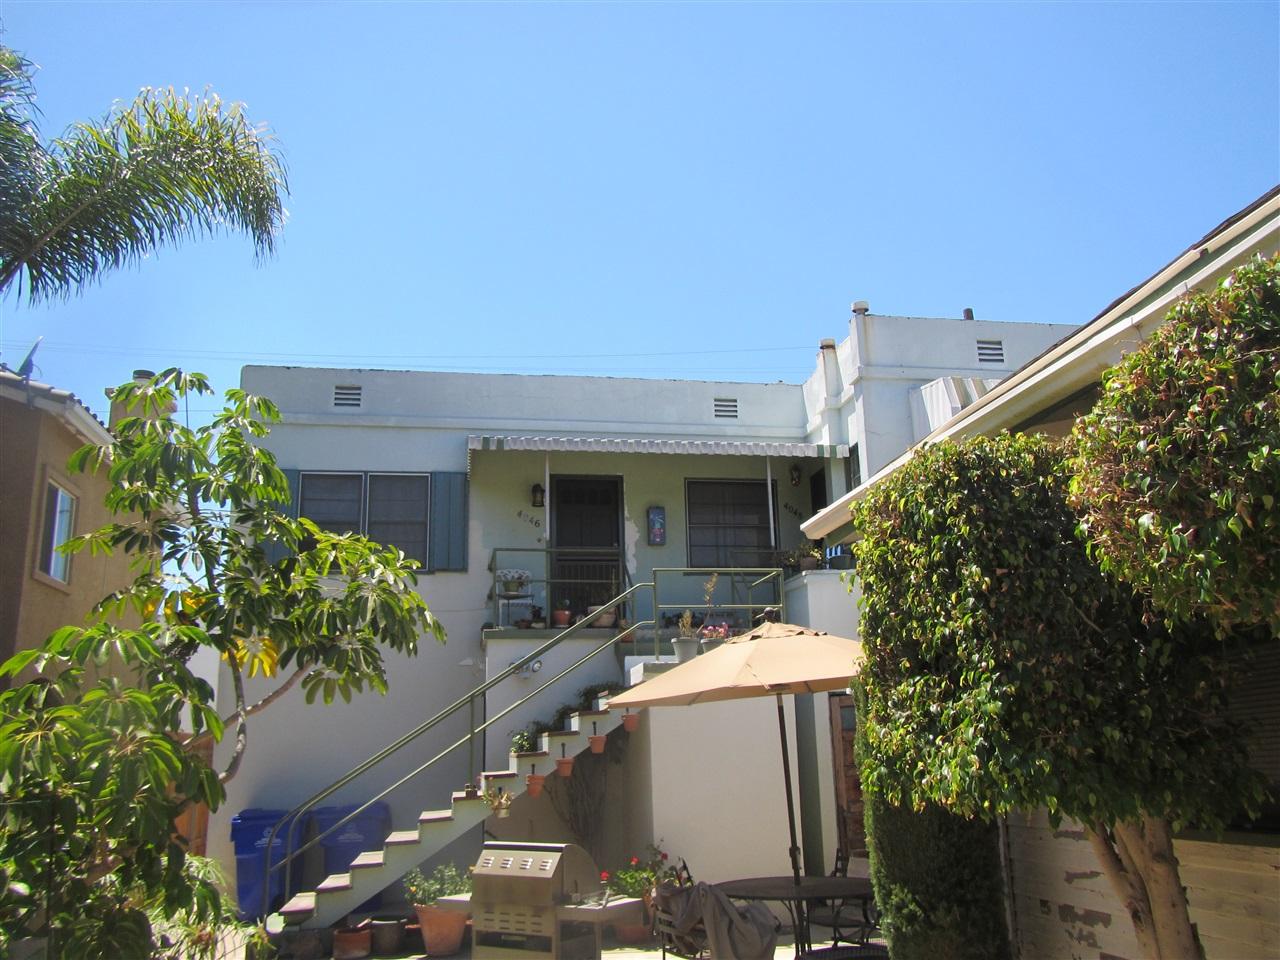 4042-4048 Ohio Street -  San Diego, CA 92104